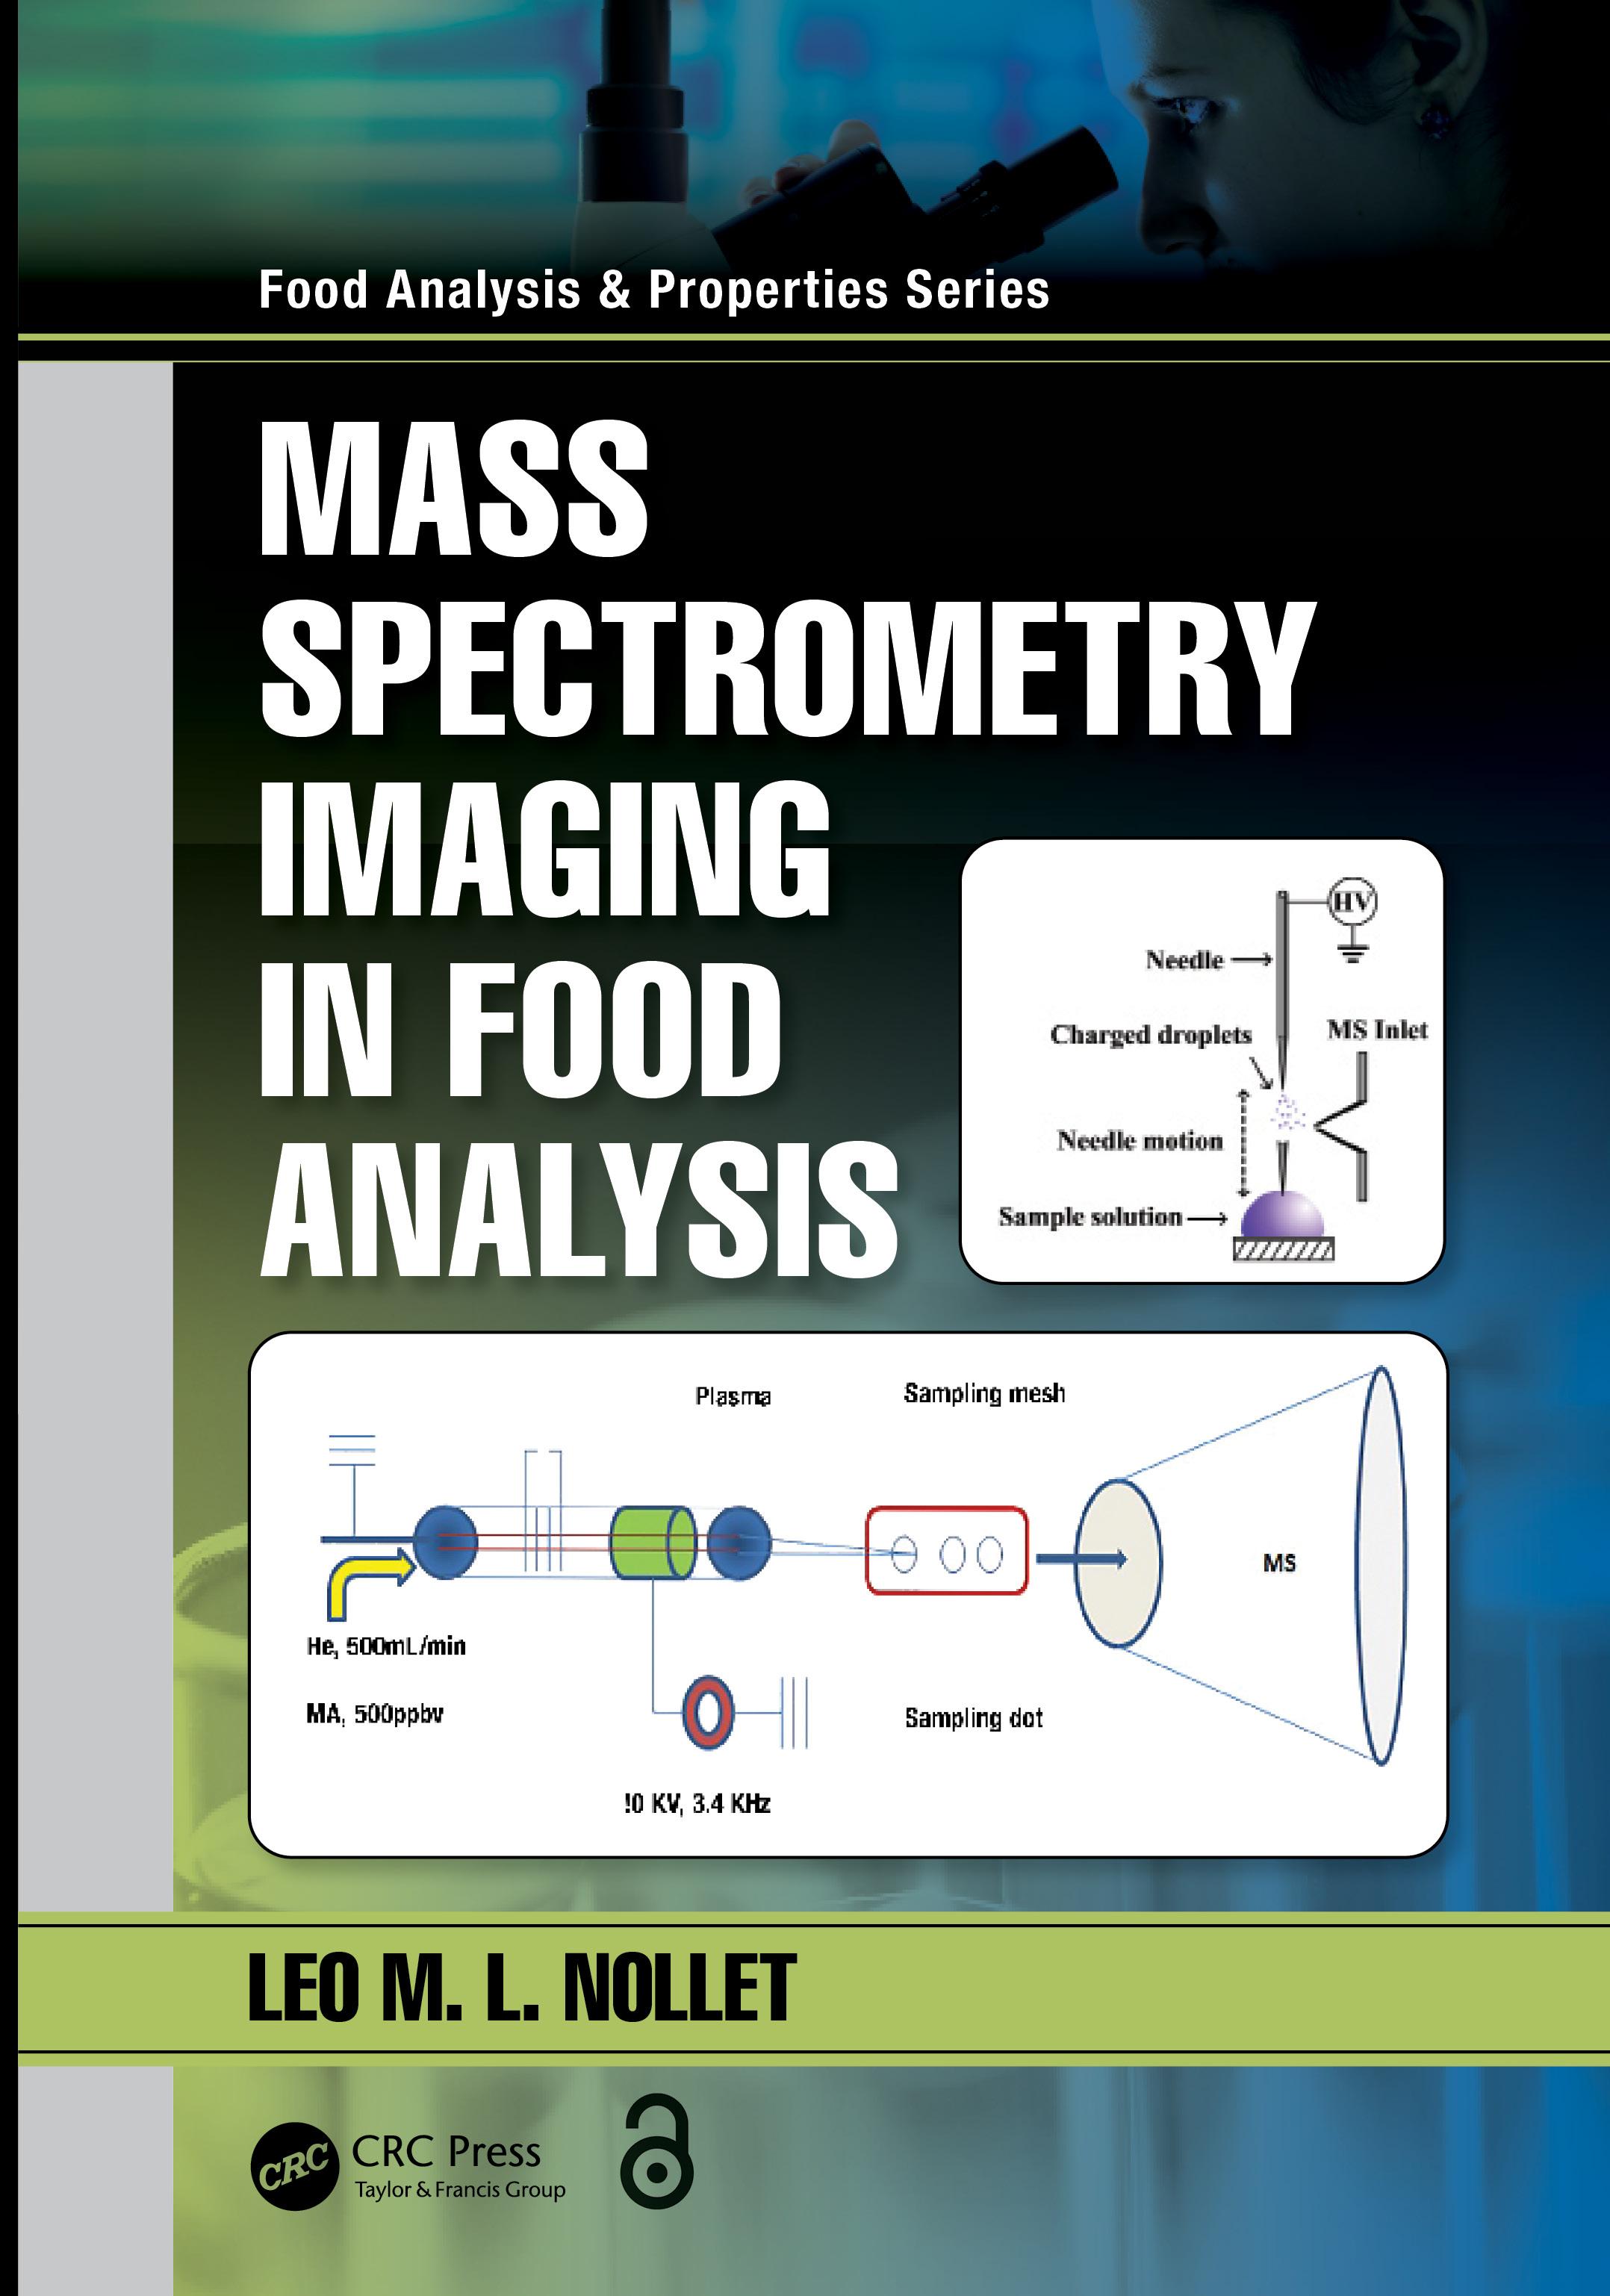 Desorption Electrospray Ionization Mass Spectrometry Imaging in Food Applications